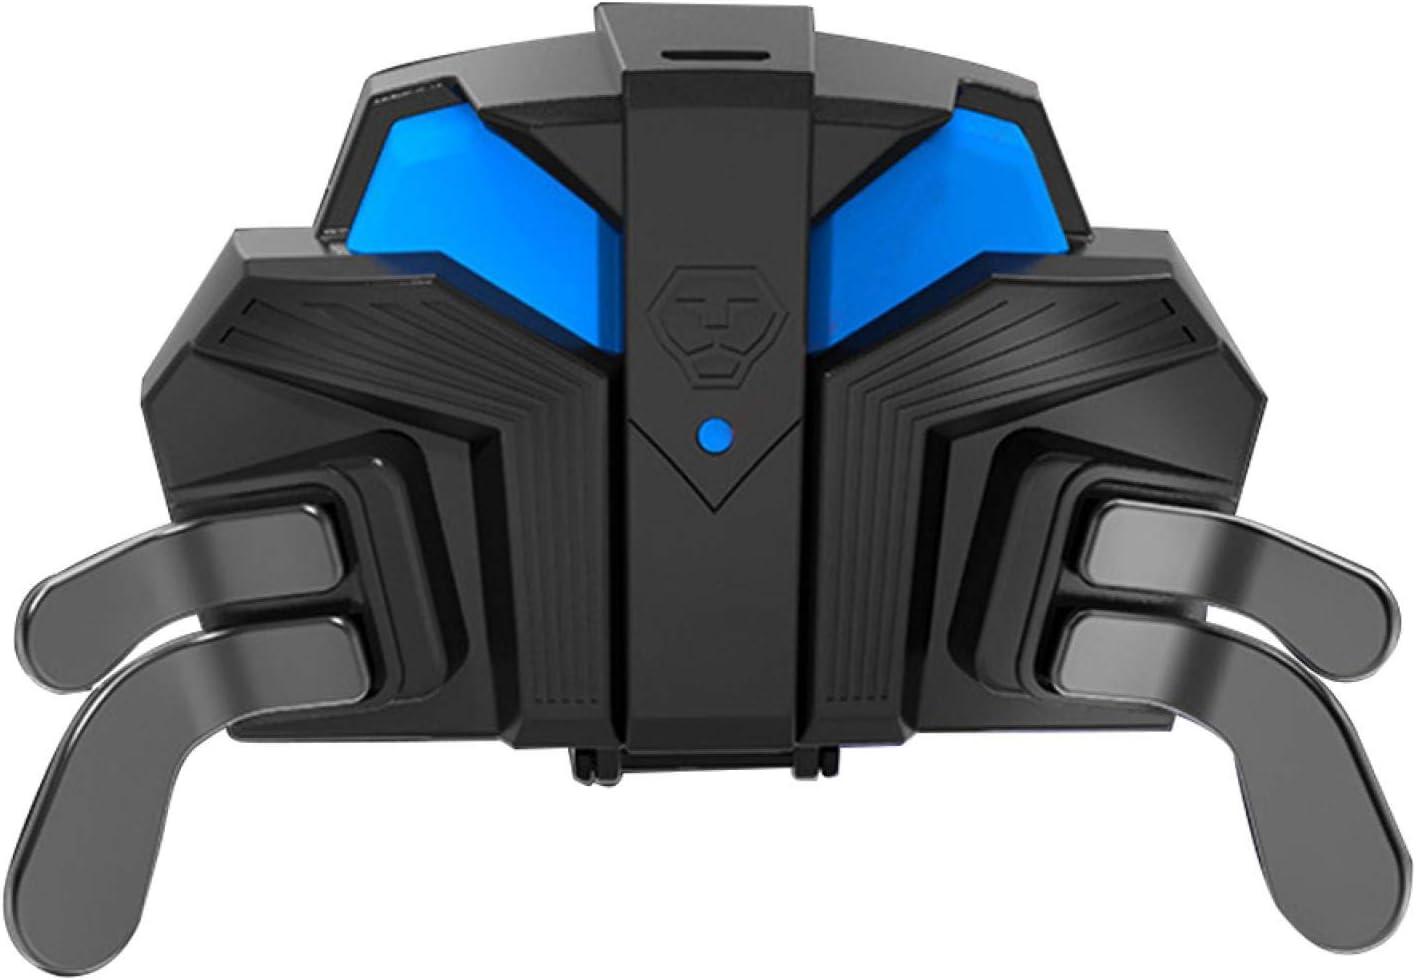 EKDJKK Back Button Attachment Fashion Ergonomic Controller Adapter Professional Portable Durable Button Accessories Game Accessories Game Component Paddles Accessories: Home & Kitchen